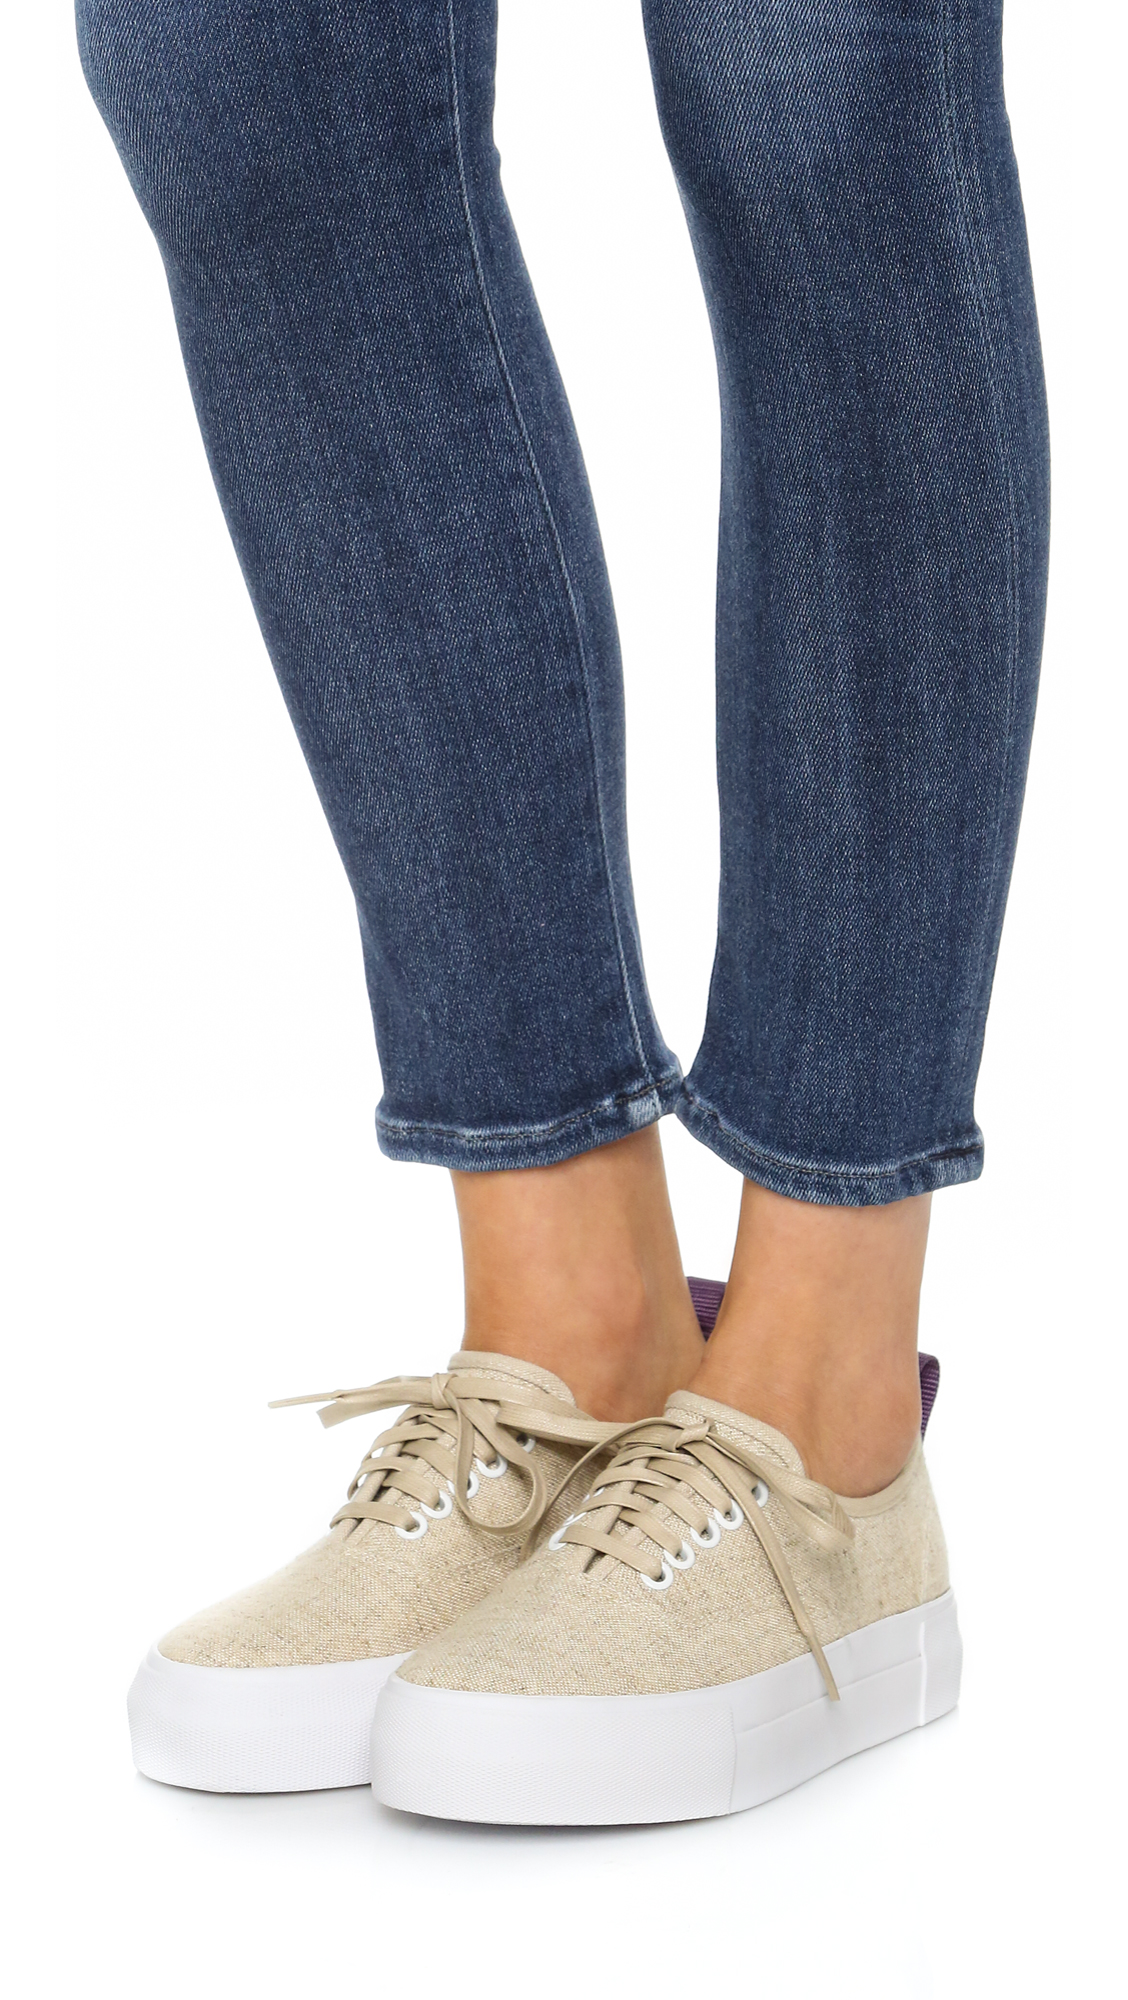 Les Chaussures De Sport De Mère 'eytys - Bleu o3BG4AFe2R